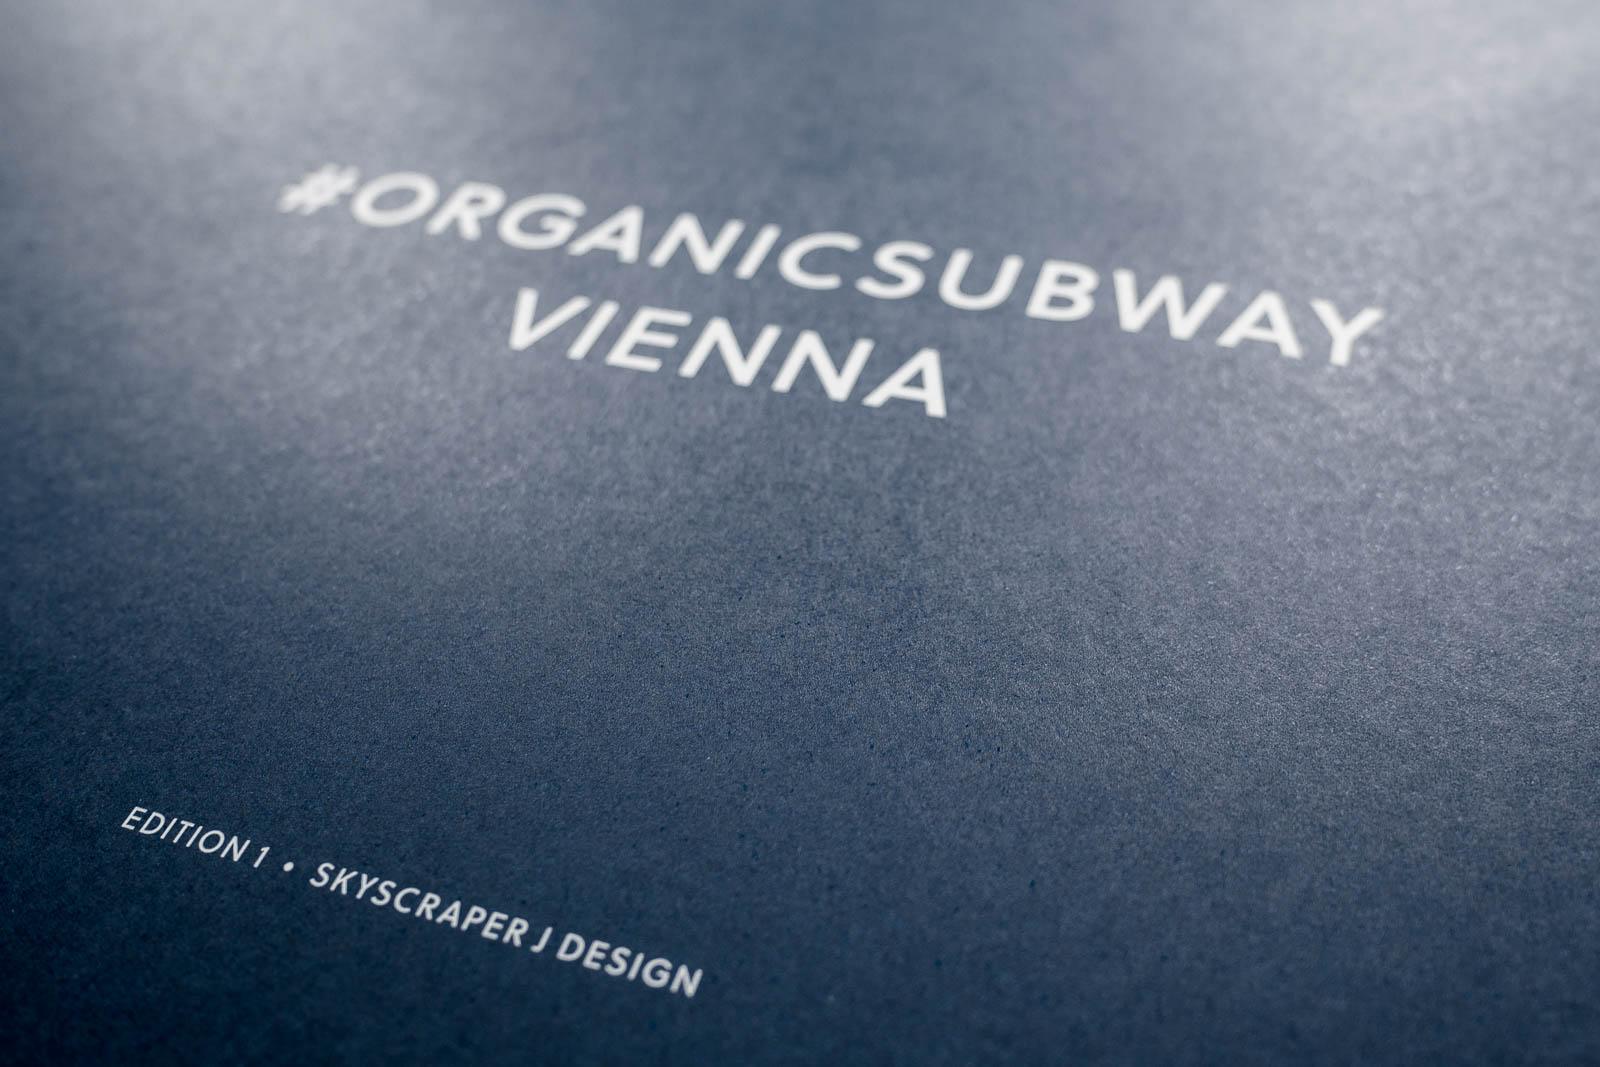 Organicsubway Vienna Still Skyscraperj 5